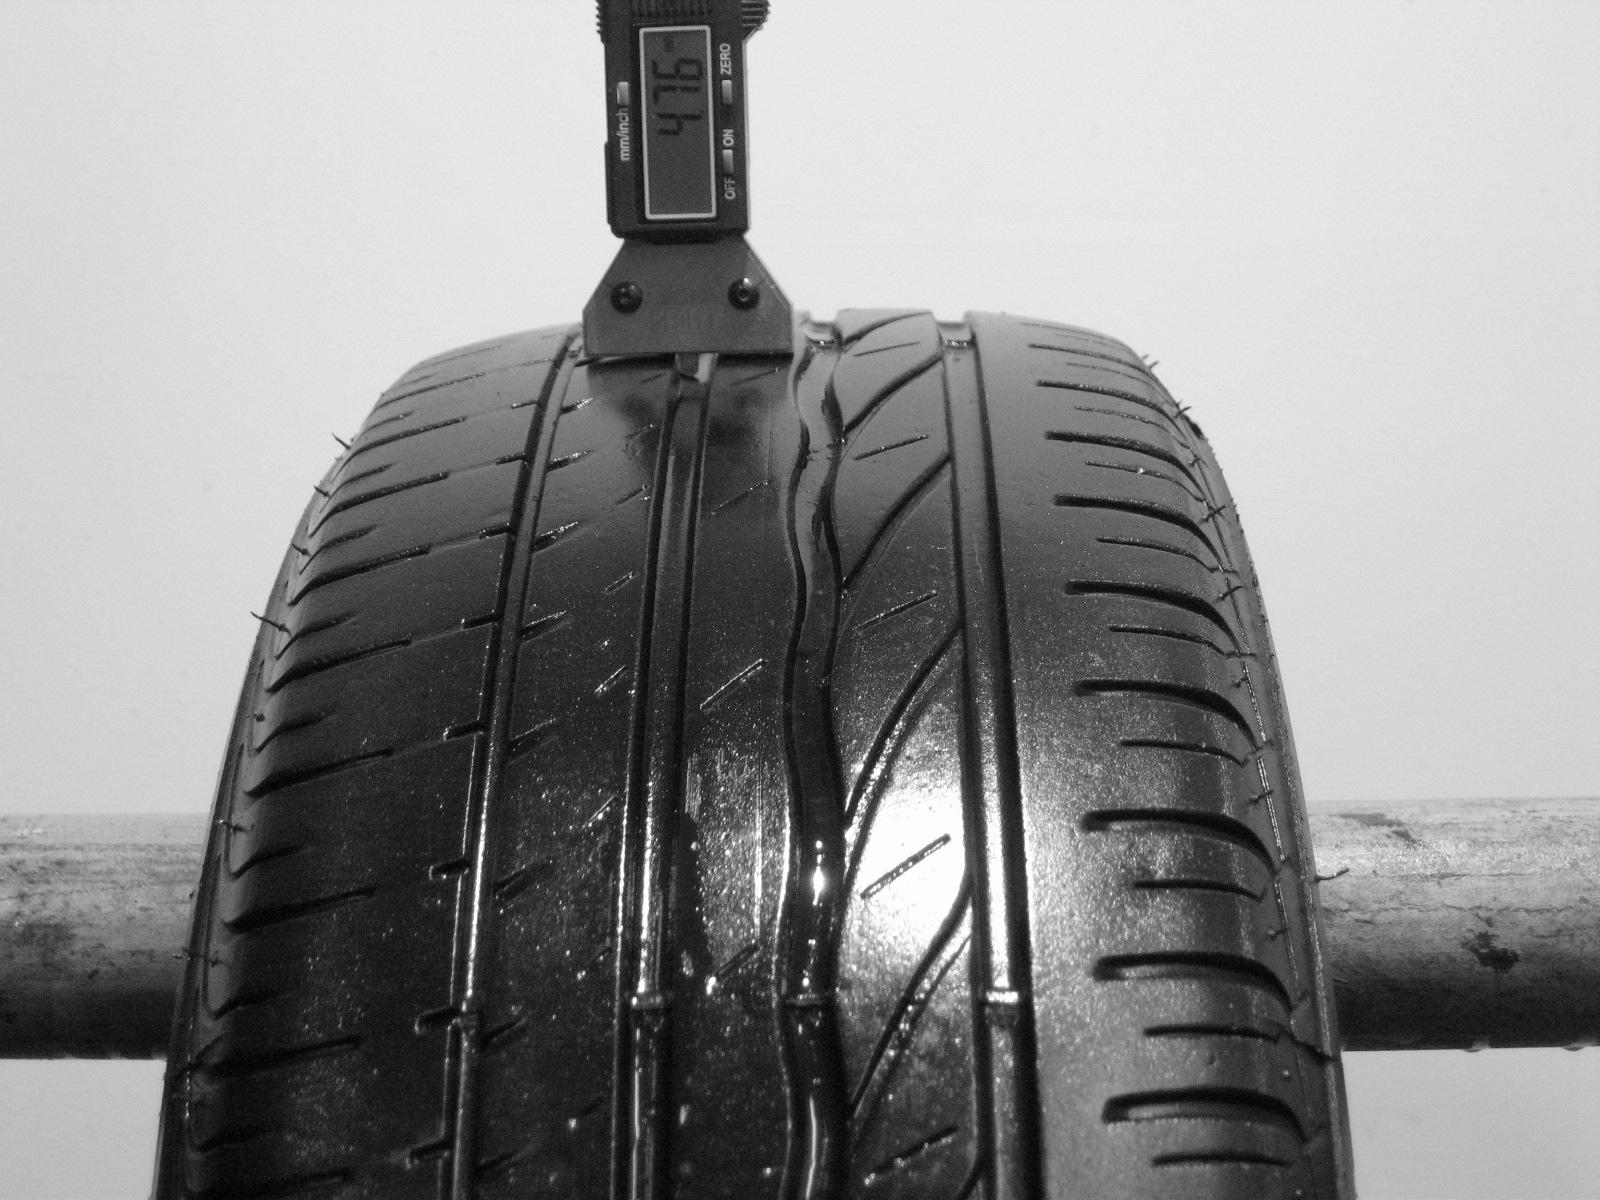 Použité-Pneu-Bazar - 205/60 R16 BRIDGESTONE TURANZA ER300 92H -kusovka-rezerva 3mm